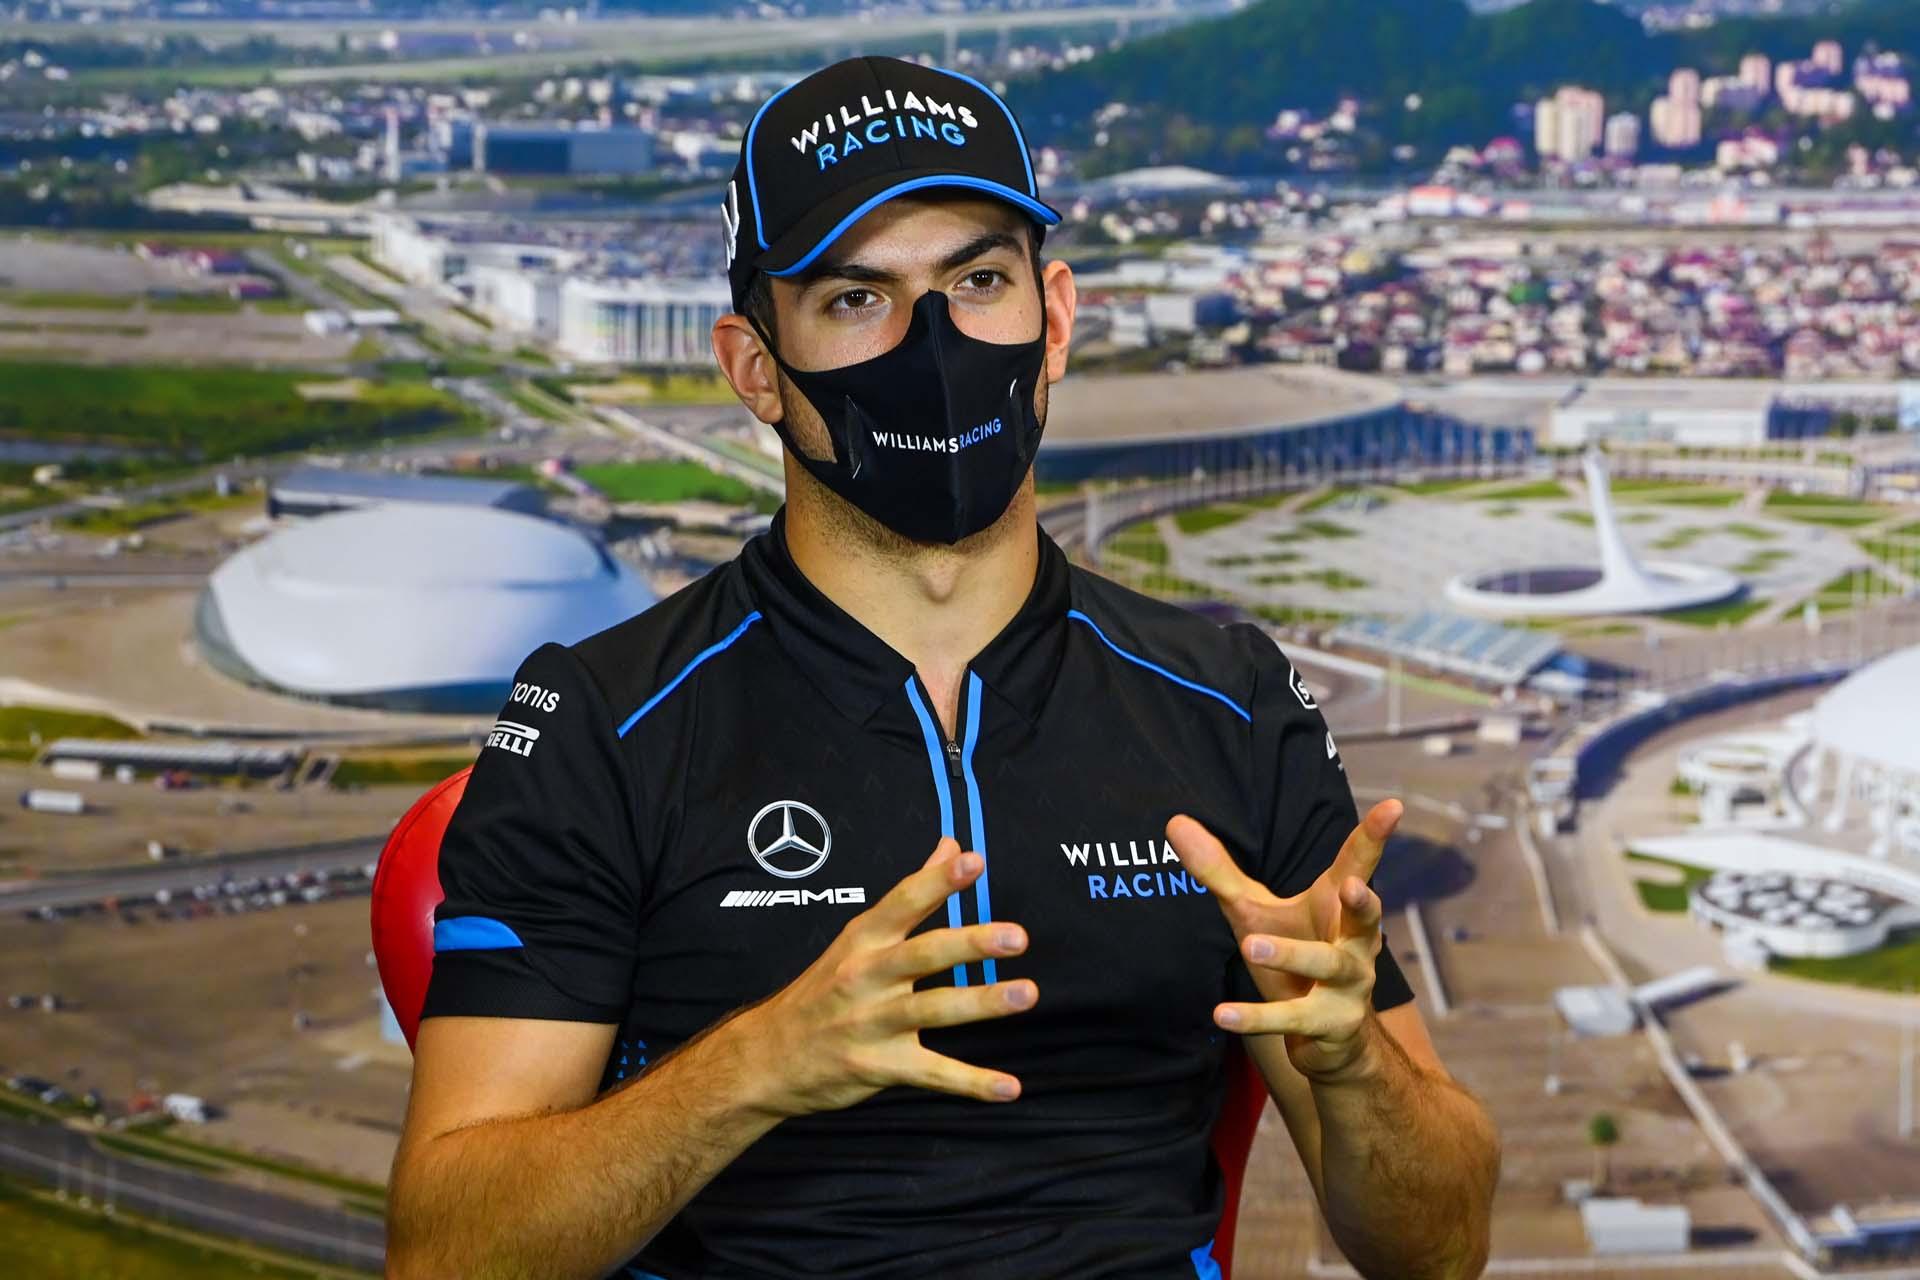 Motor Racing - Formula One World Championship - Russian Grand Prix - Preparation Day - Sochi, Russia